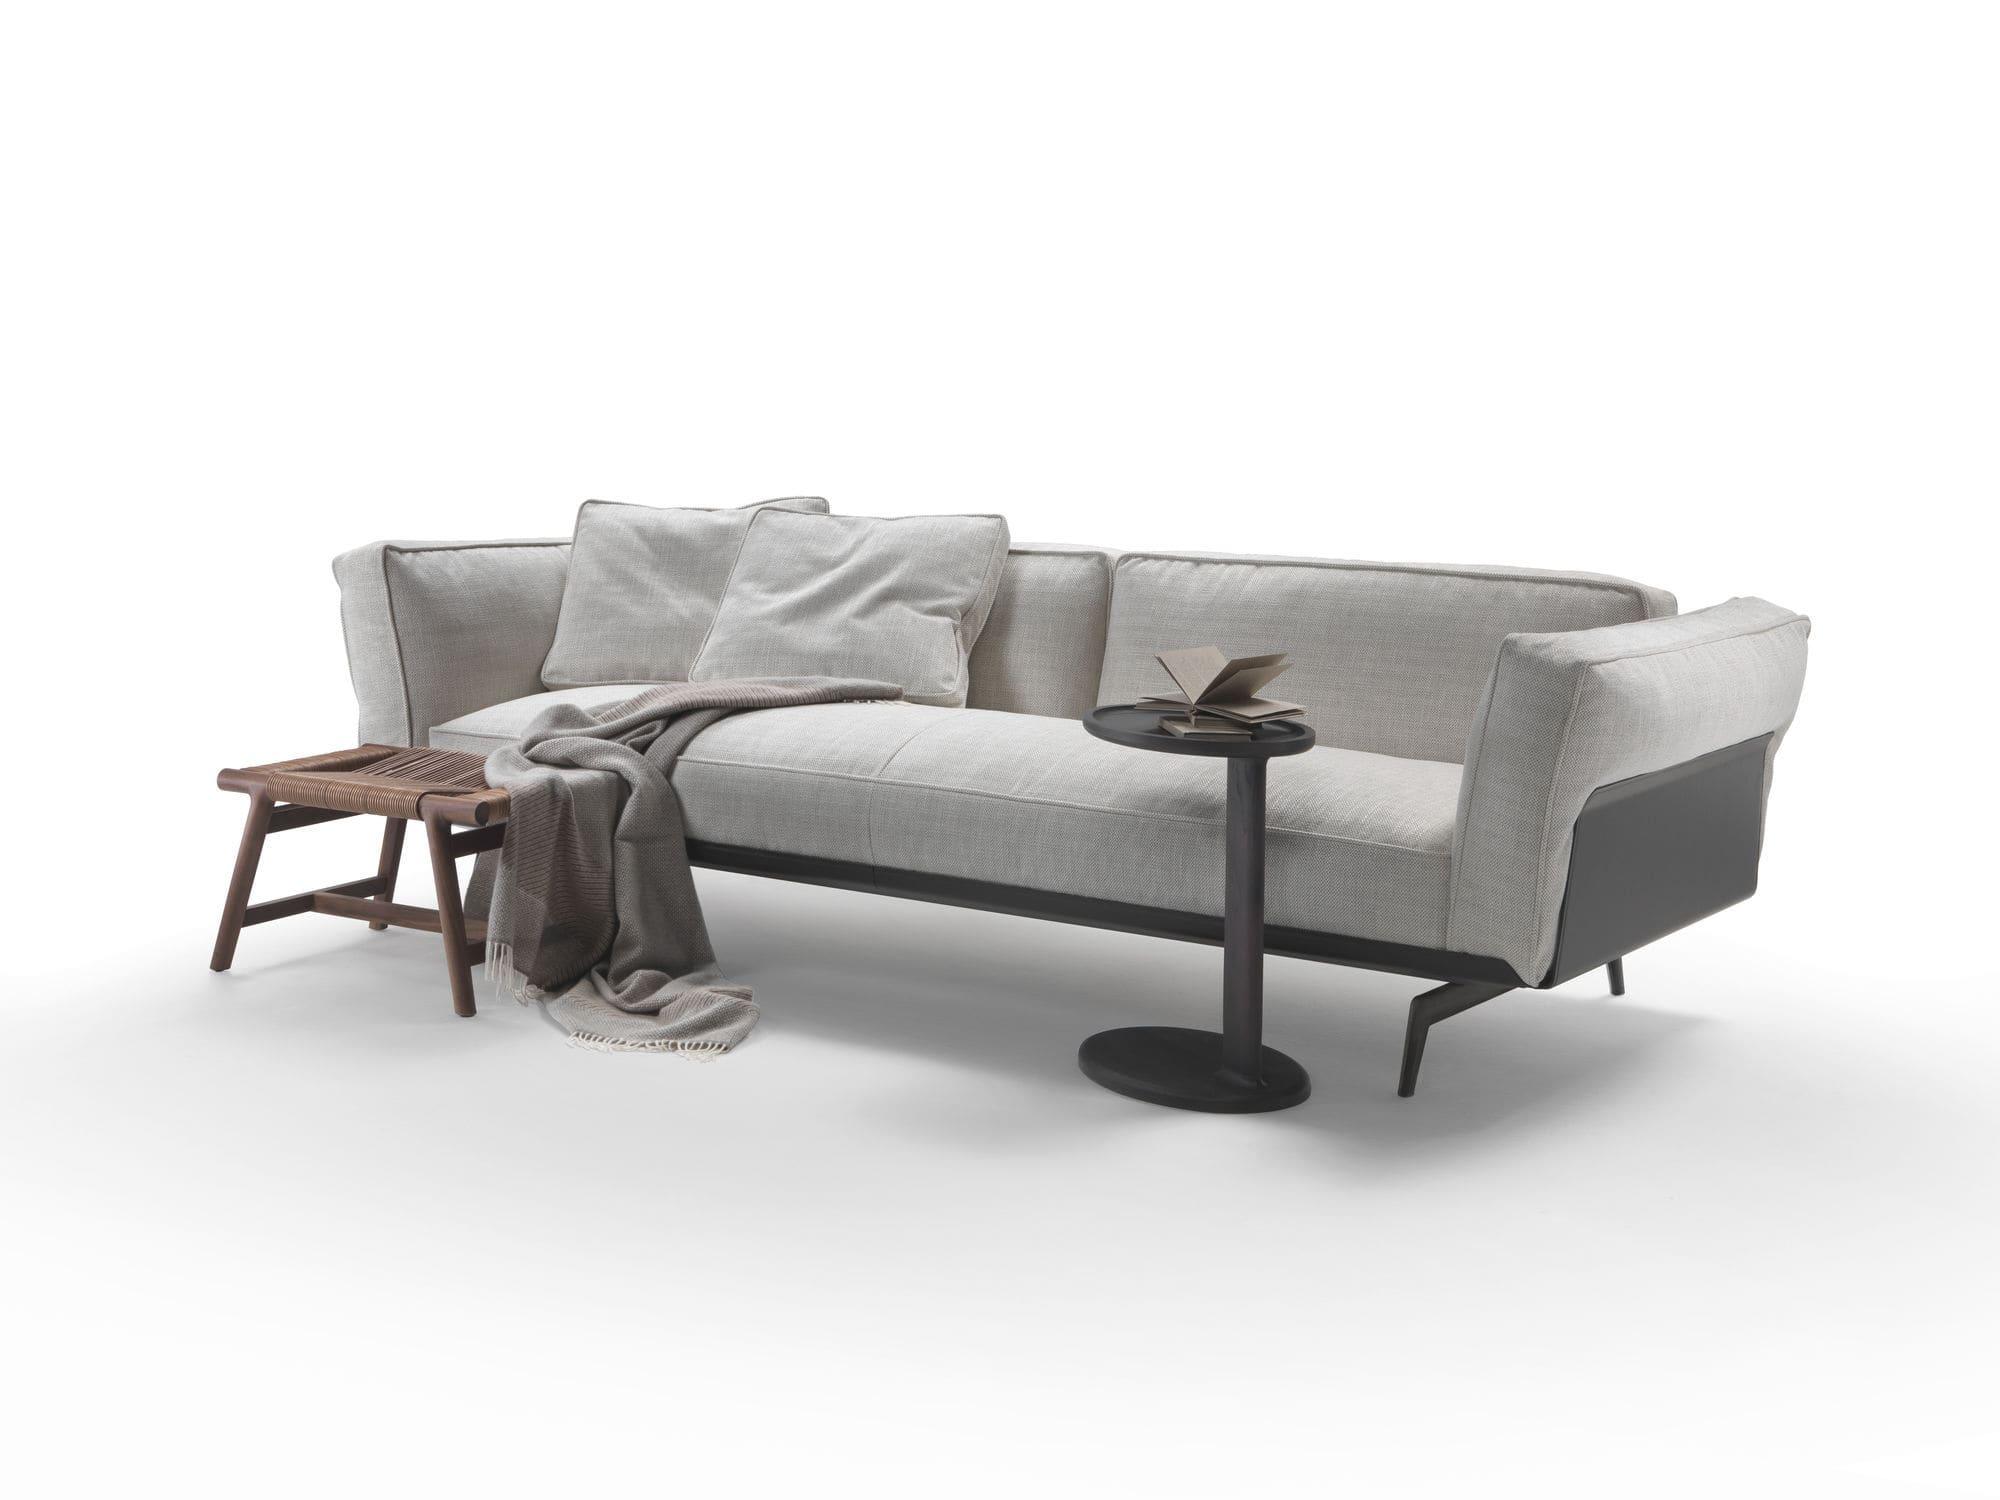 Modular sofa contemporary fabric leather ESTE FLEXFORM